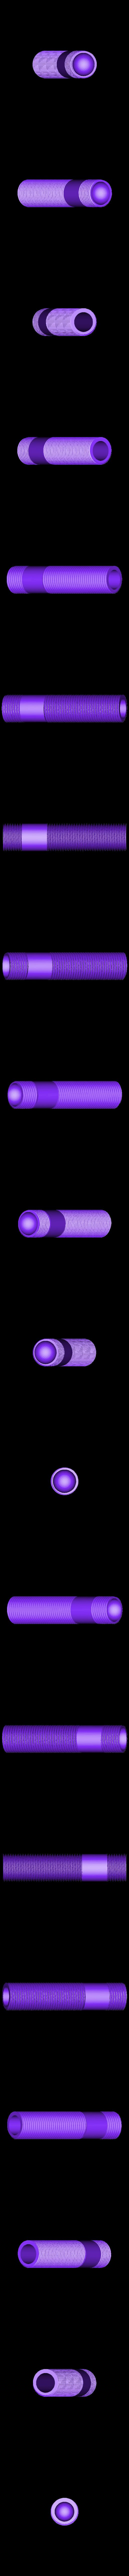 vis de pied.stl Download STL file Articulated support camera , photo , video , creality ender 3 standard screws photo • 3D printable template, benj2365